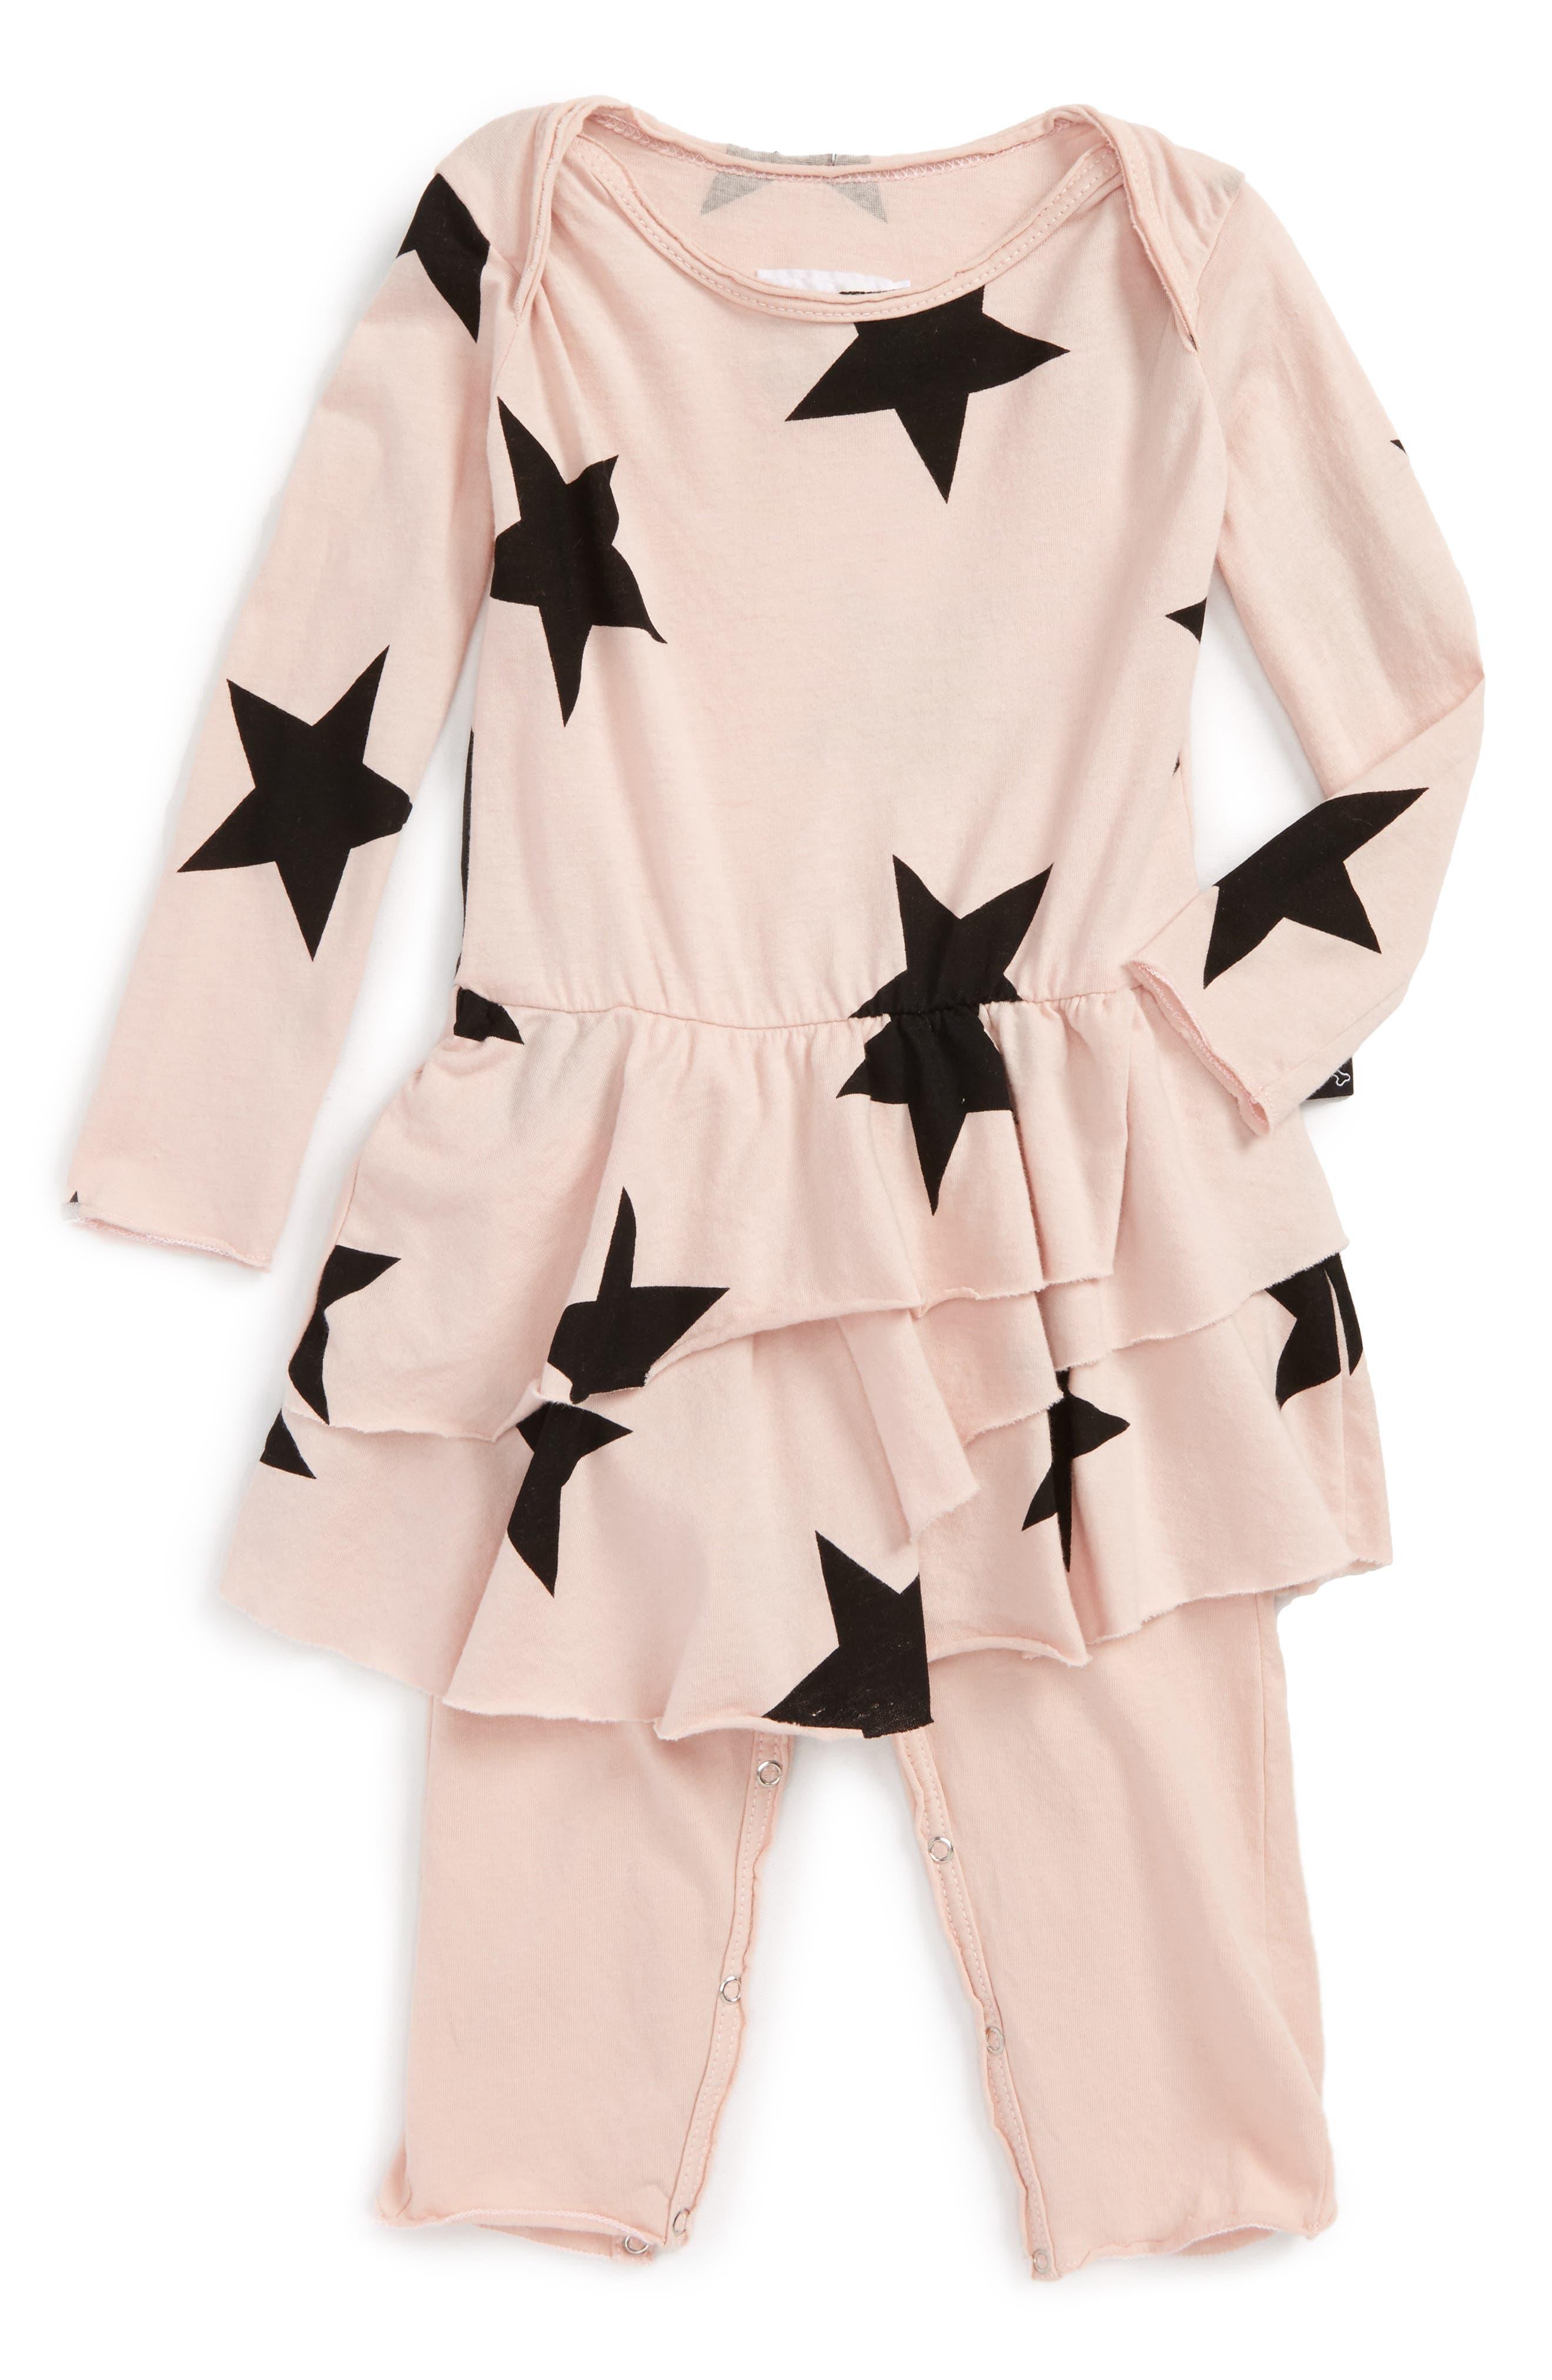 Main Image - NUNUNU Star Print Romper (Baby Girls)